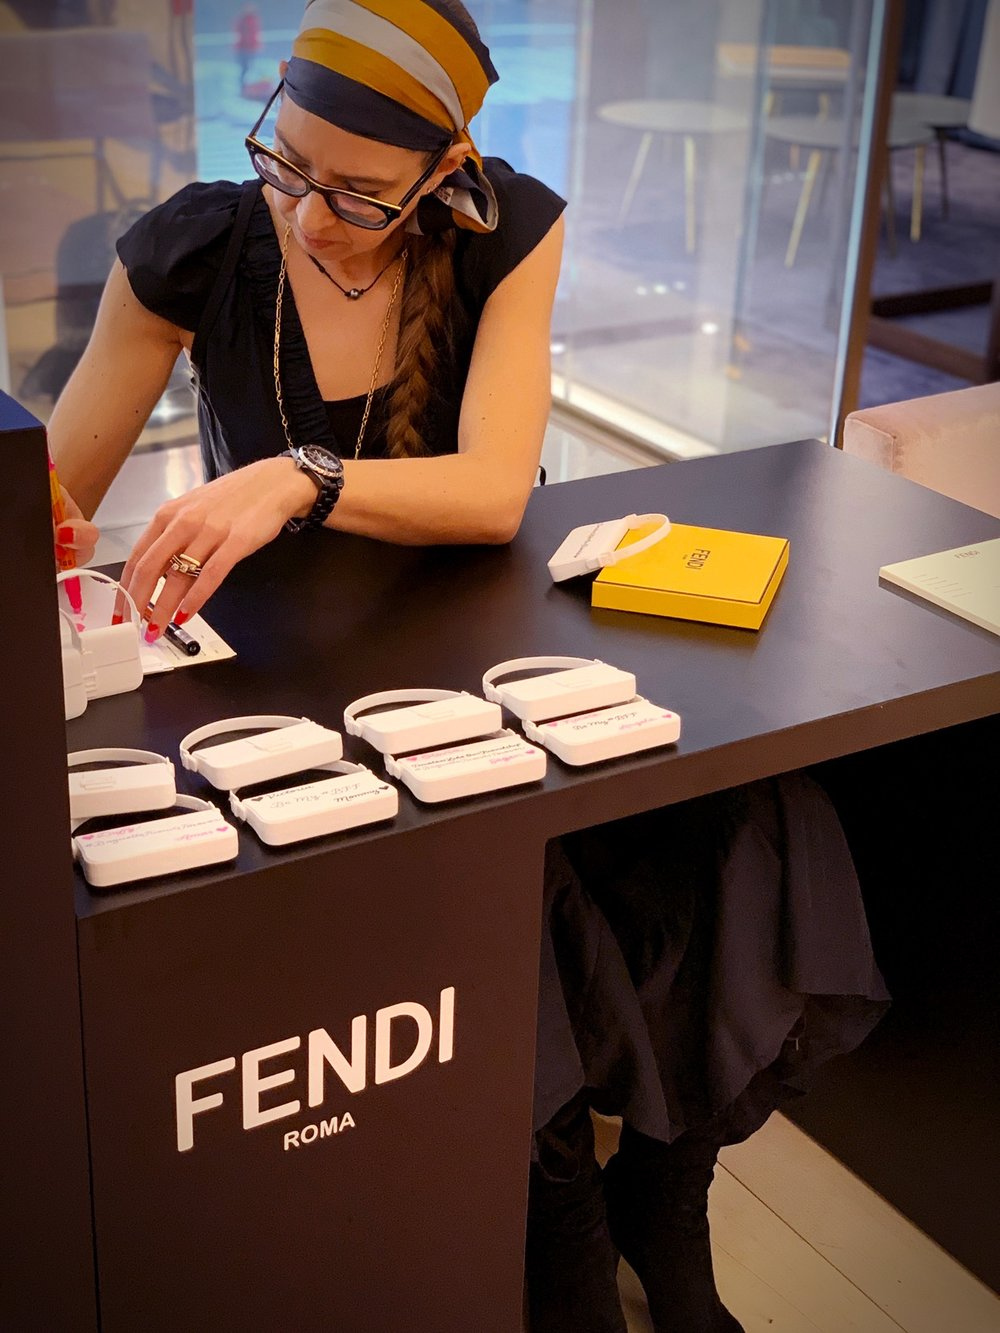 Fendi Micro Baguette Activation - On-Site Calligraphy, Fendi Madison Ave.